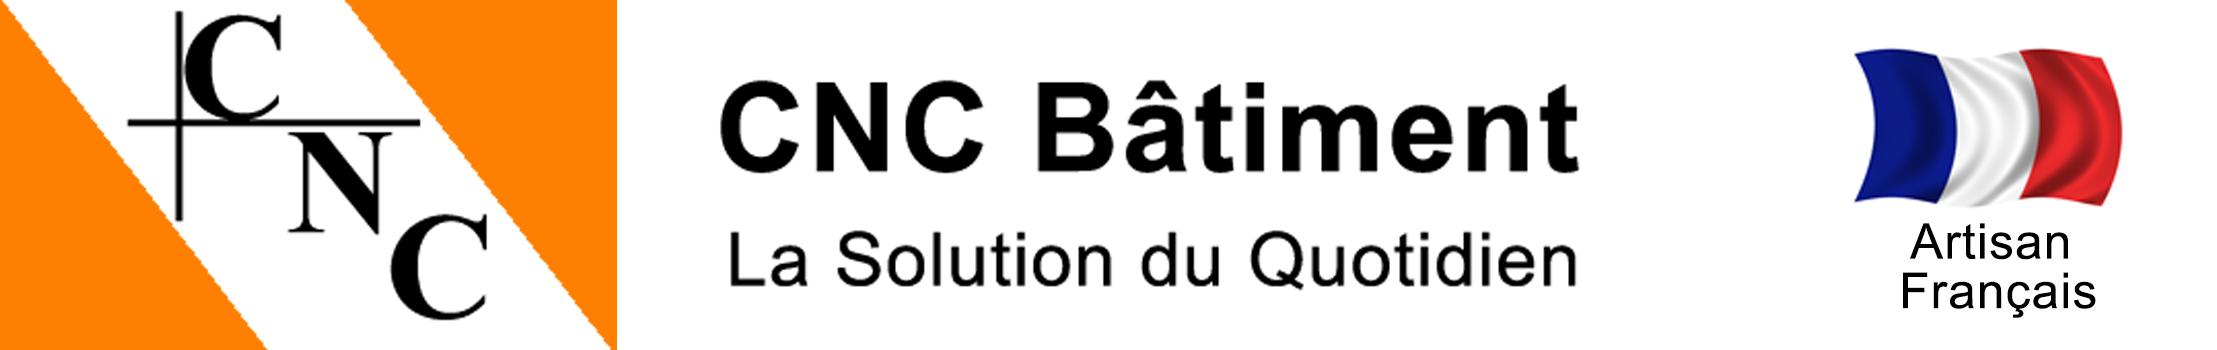 Logo cnc accueil artisan Français Rambouillet